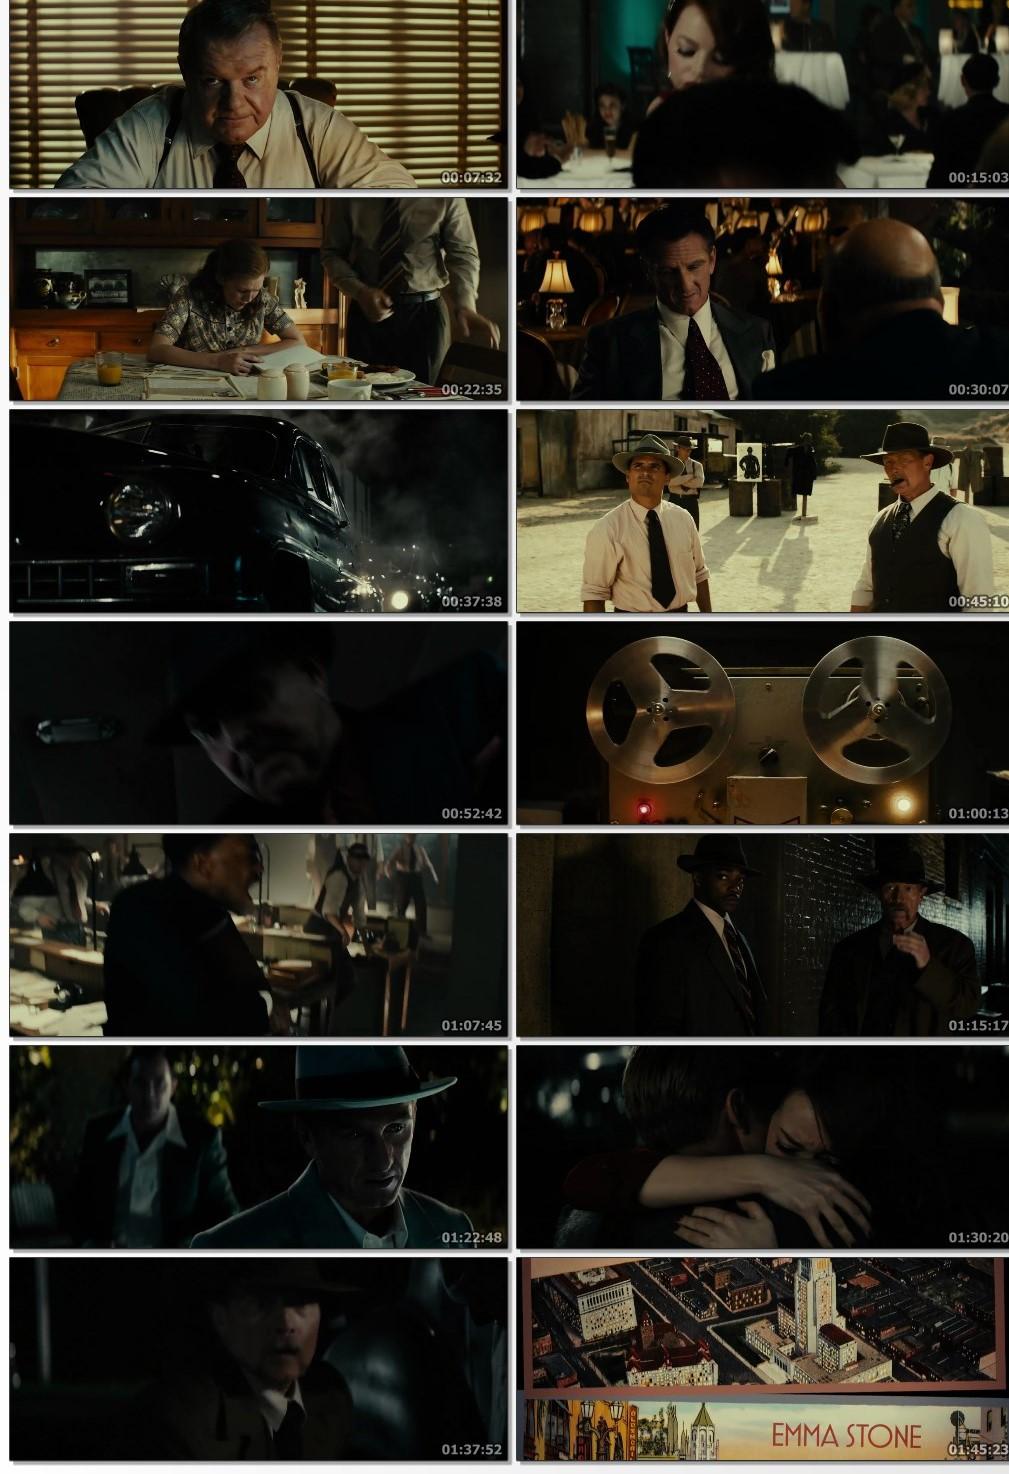 Gangster-Squad-2013-Hindi-Dual-Audio-720p-Blu-Ray-ESubs-800-MB-mkv-thumbs31de533e012e109b